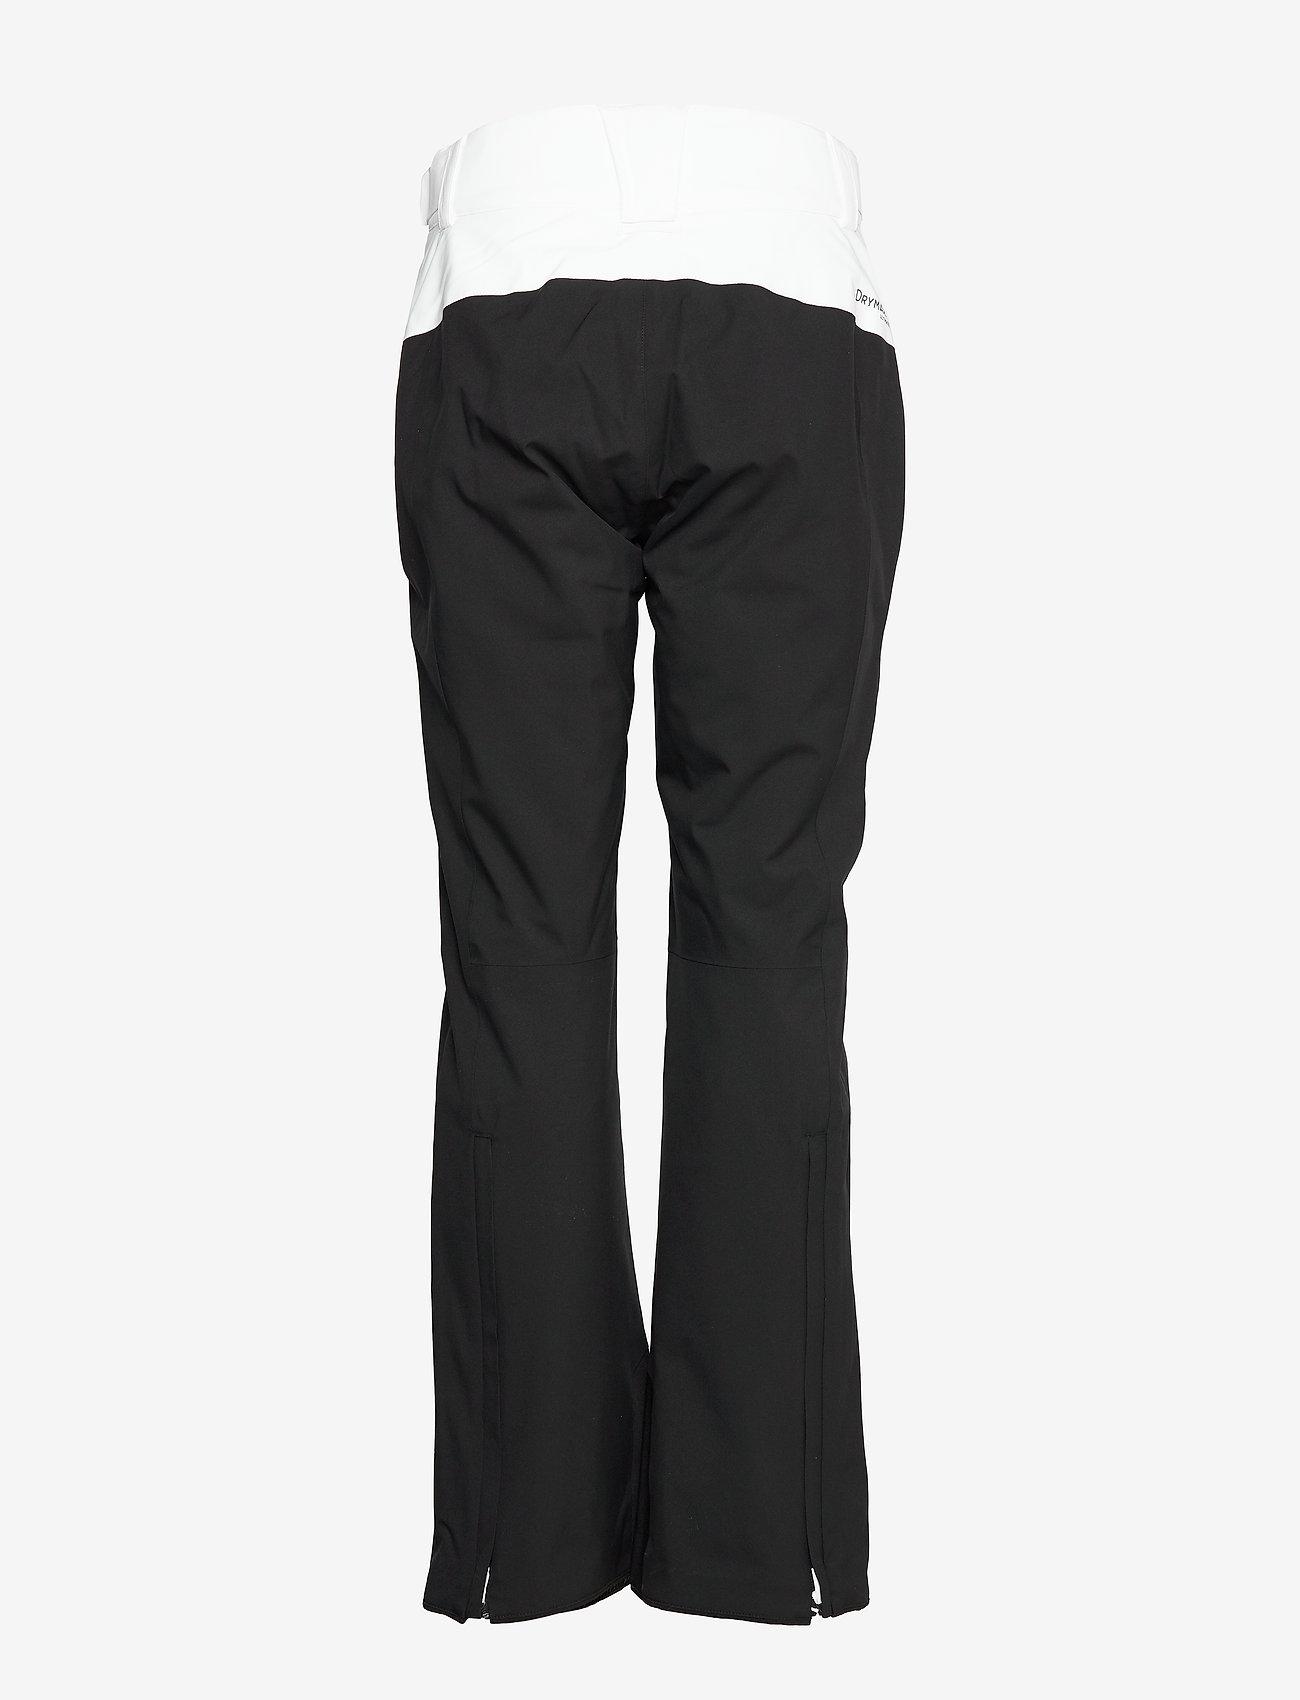 Halti - Podium II W Pants - insulated pants - white - 1